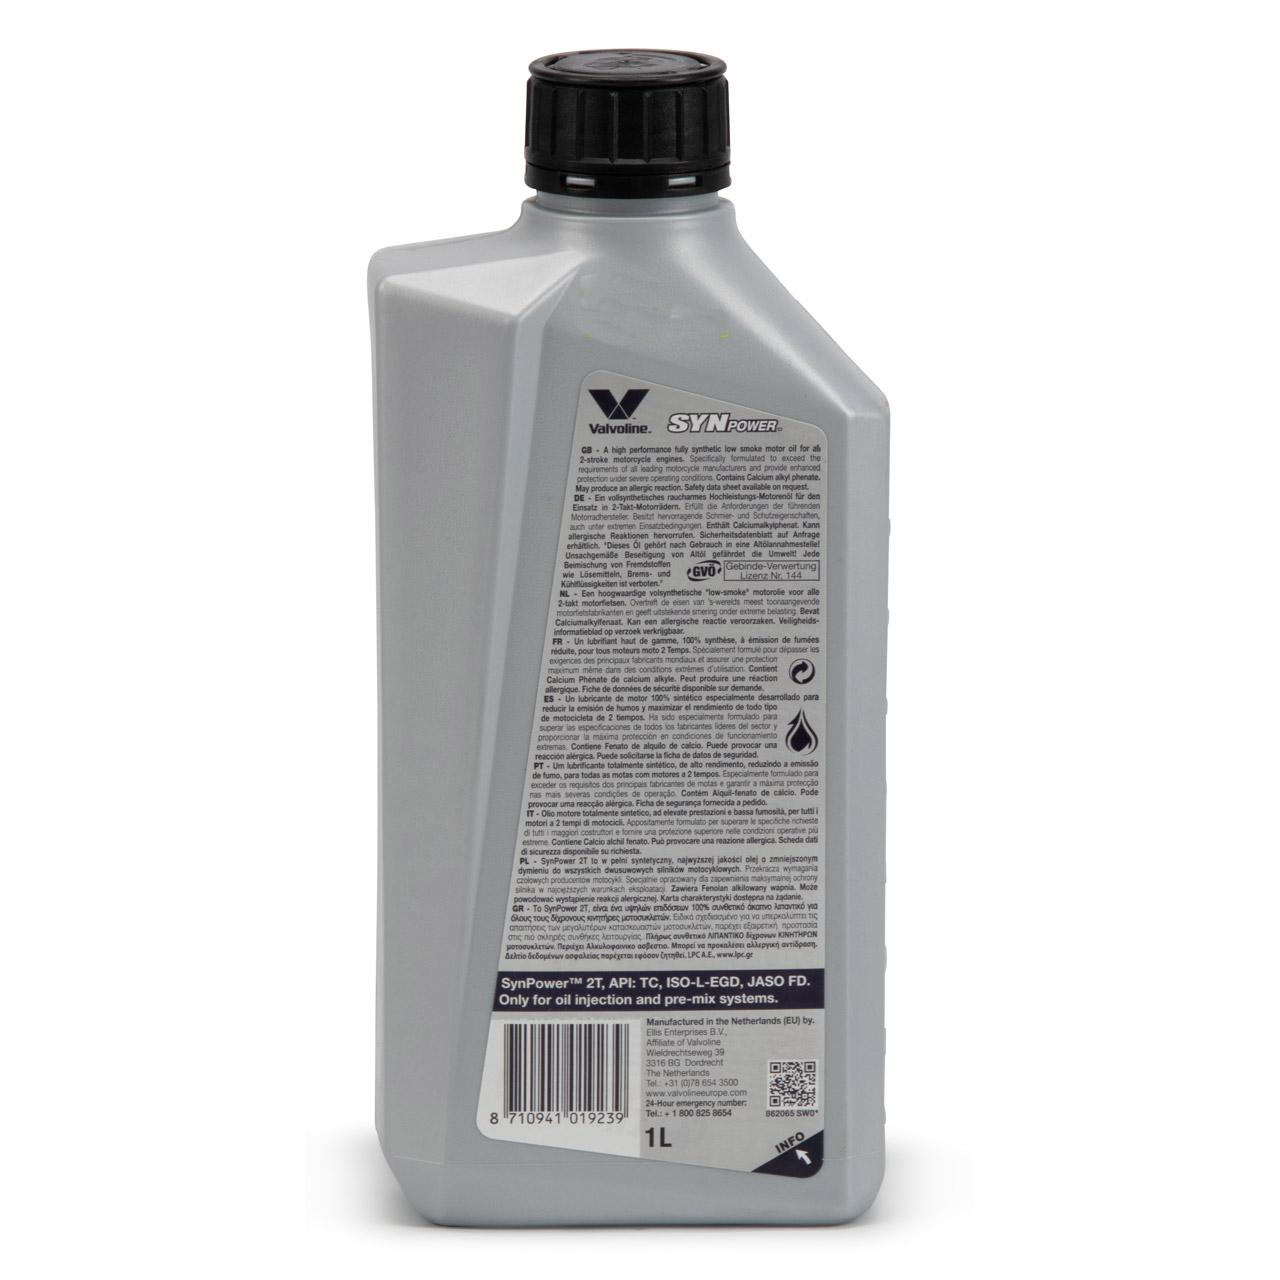 VALVOLINE Motoröl ÖL SYNPOWER 2-TAKT API TC ISO-L-EGD JASO FD - 1L 1 Liter